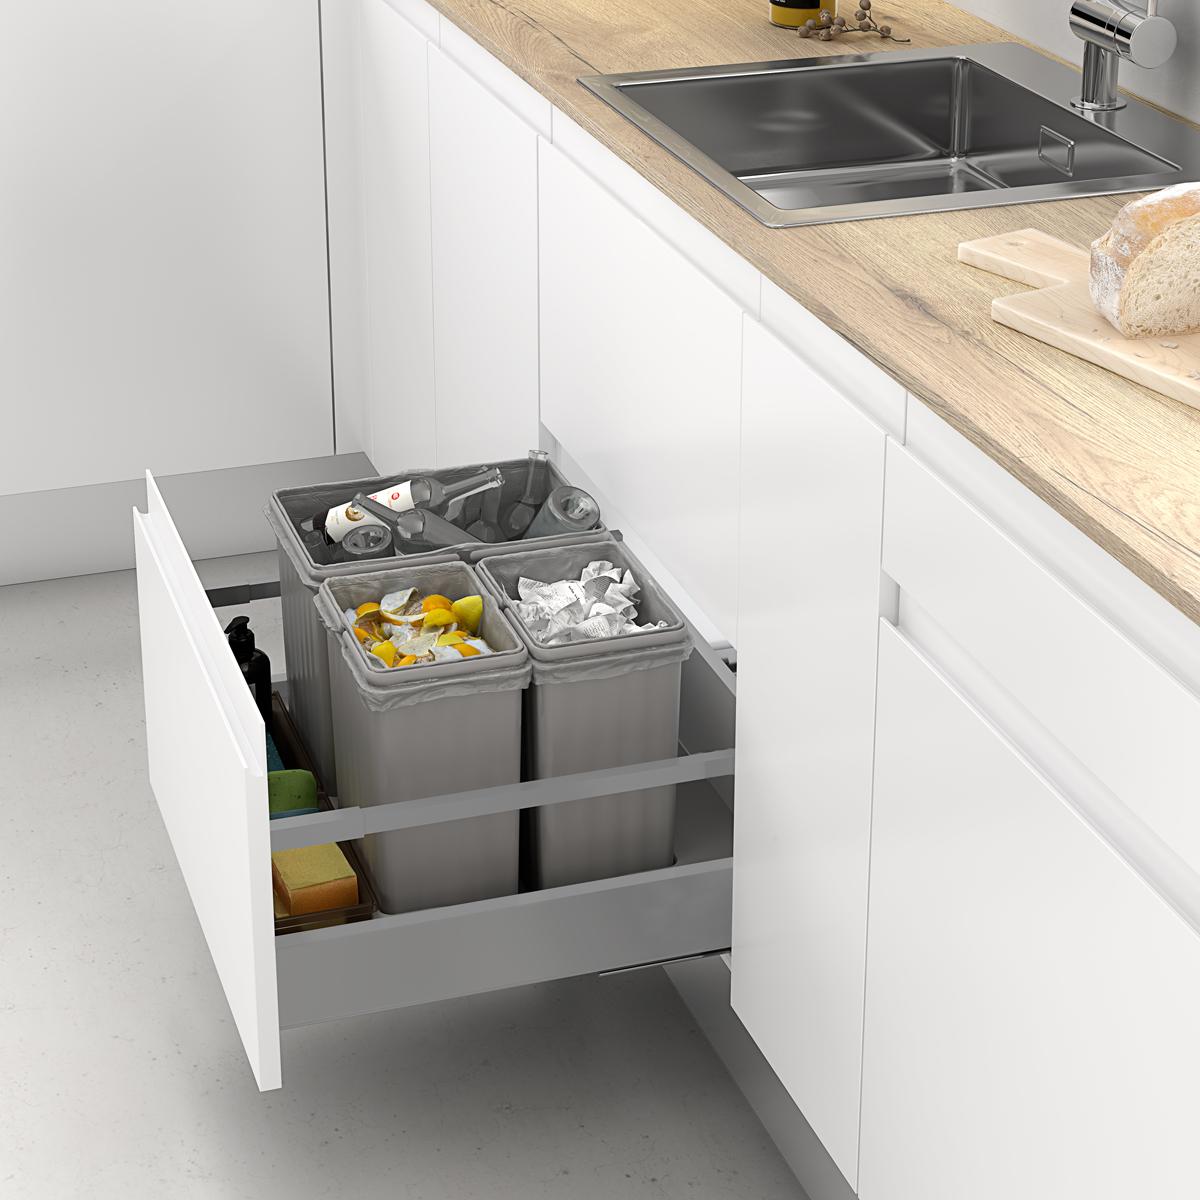 cubo para la zona de reciclaje de cajón